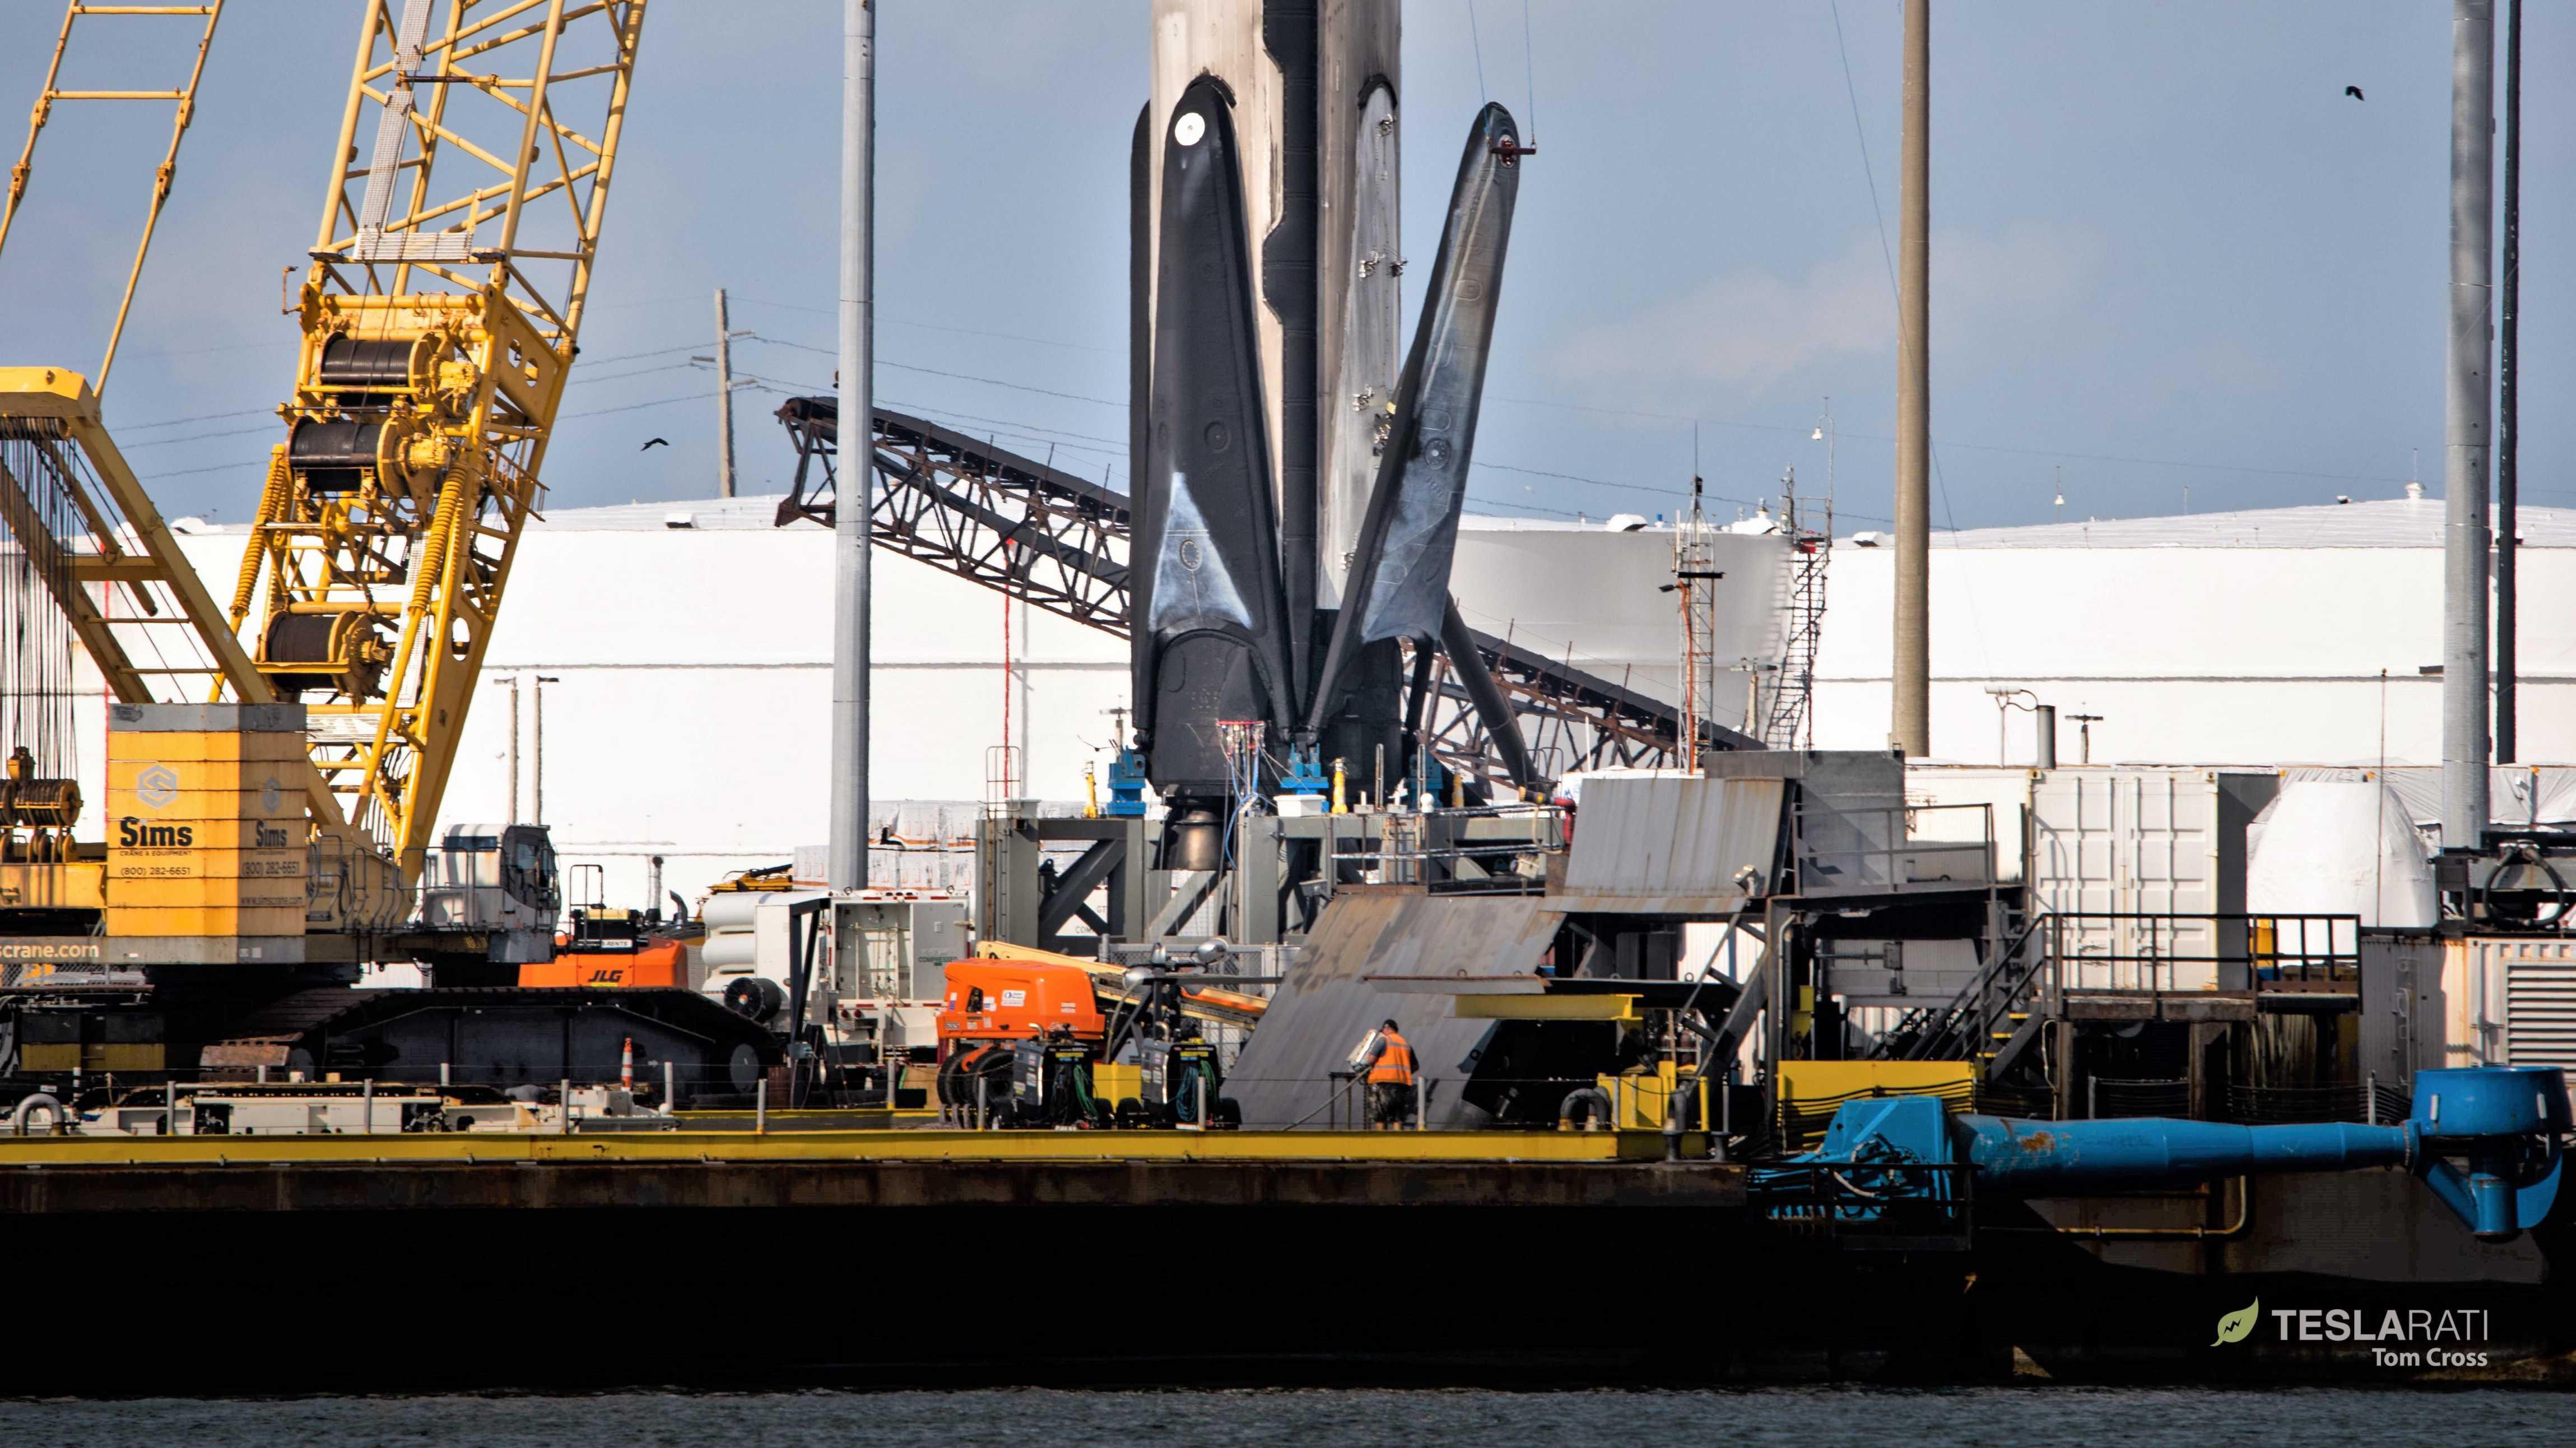 Falcon 9 b1056 leg retraction 3 of 4 050719 (Tom Cross) 1 (c)